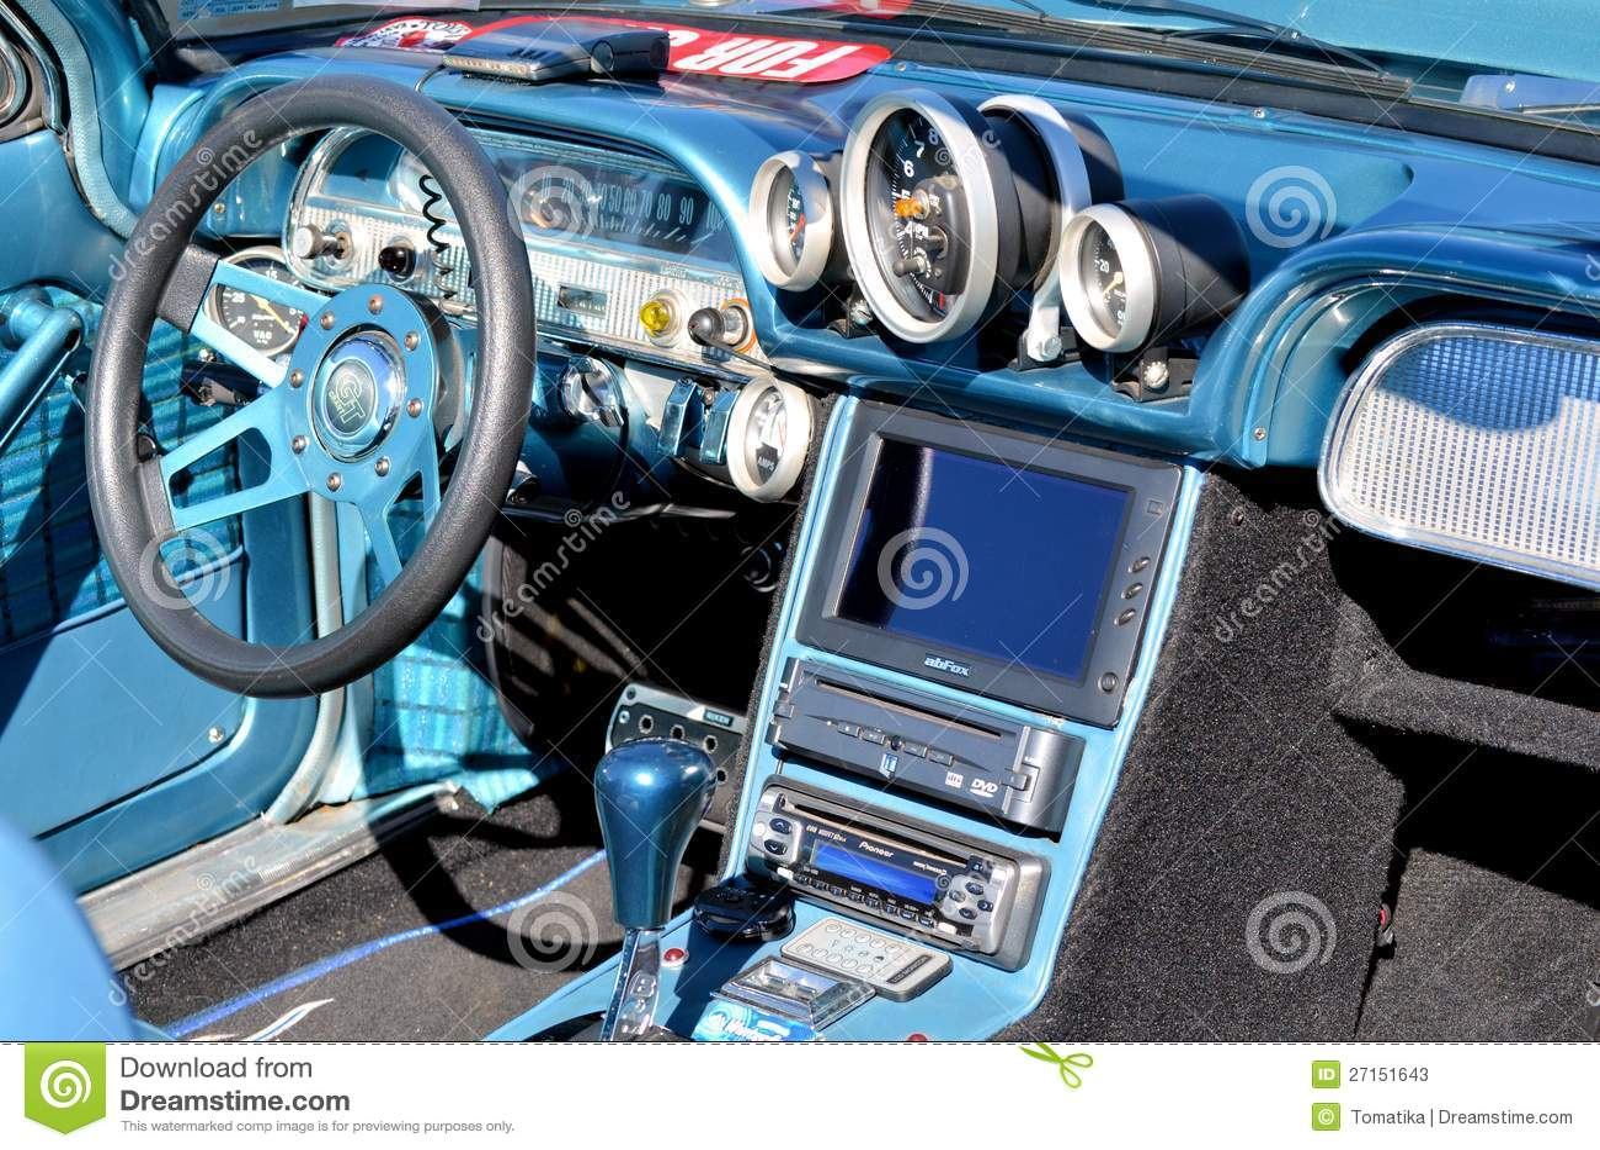 Image Result For Automotive Joba